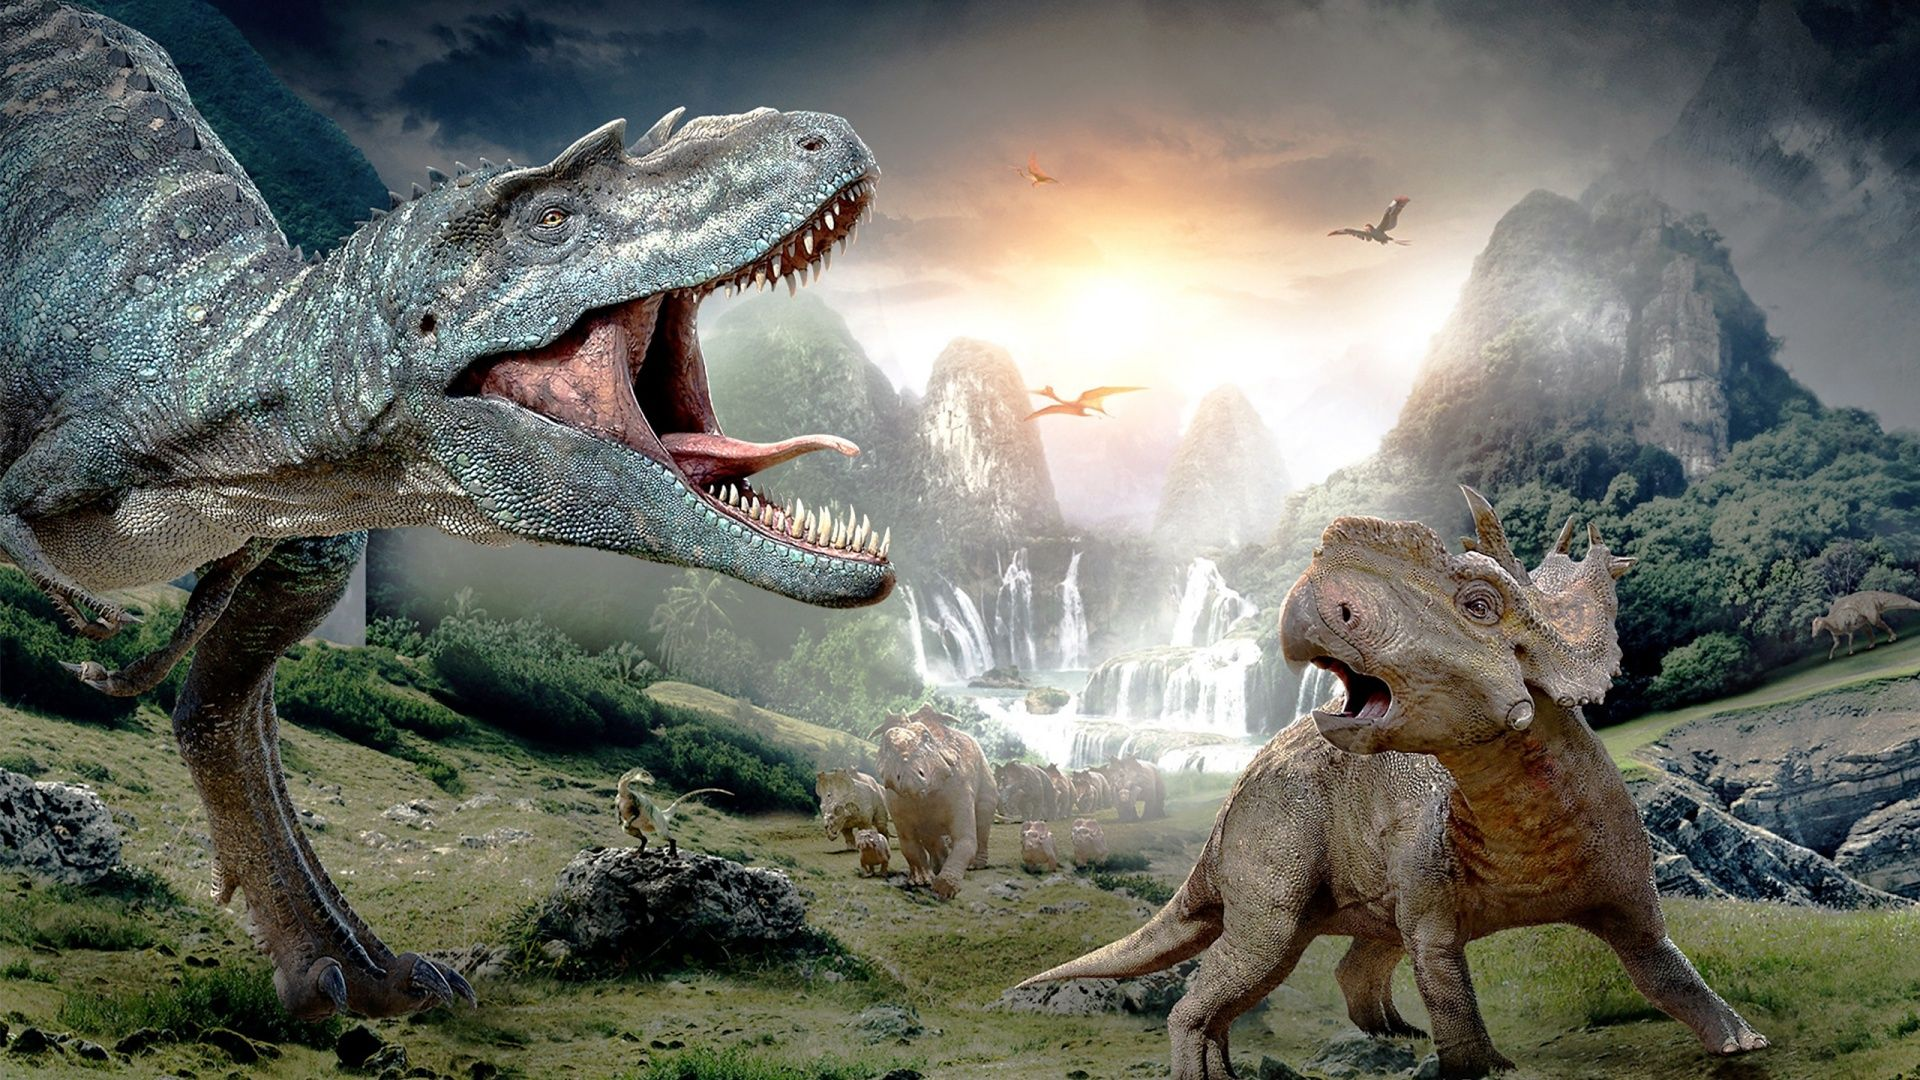 Download Dinosaur Genovic Wallpaper 1920x1080 Full Hd Wallpapers